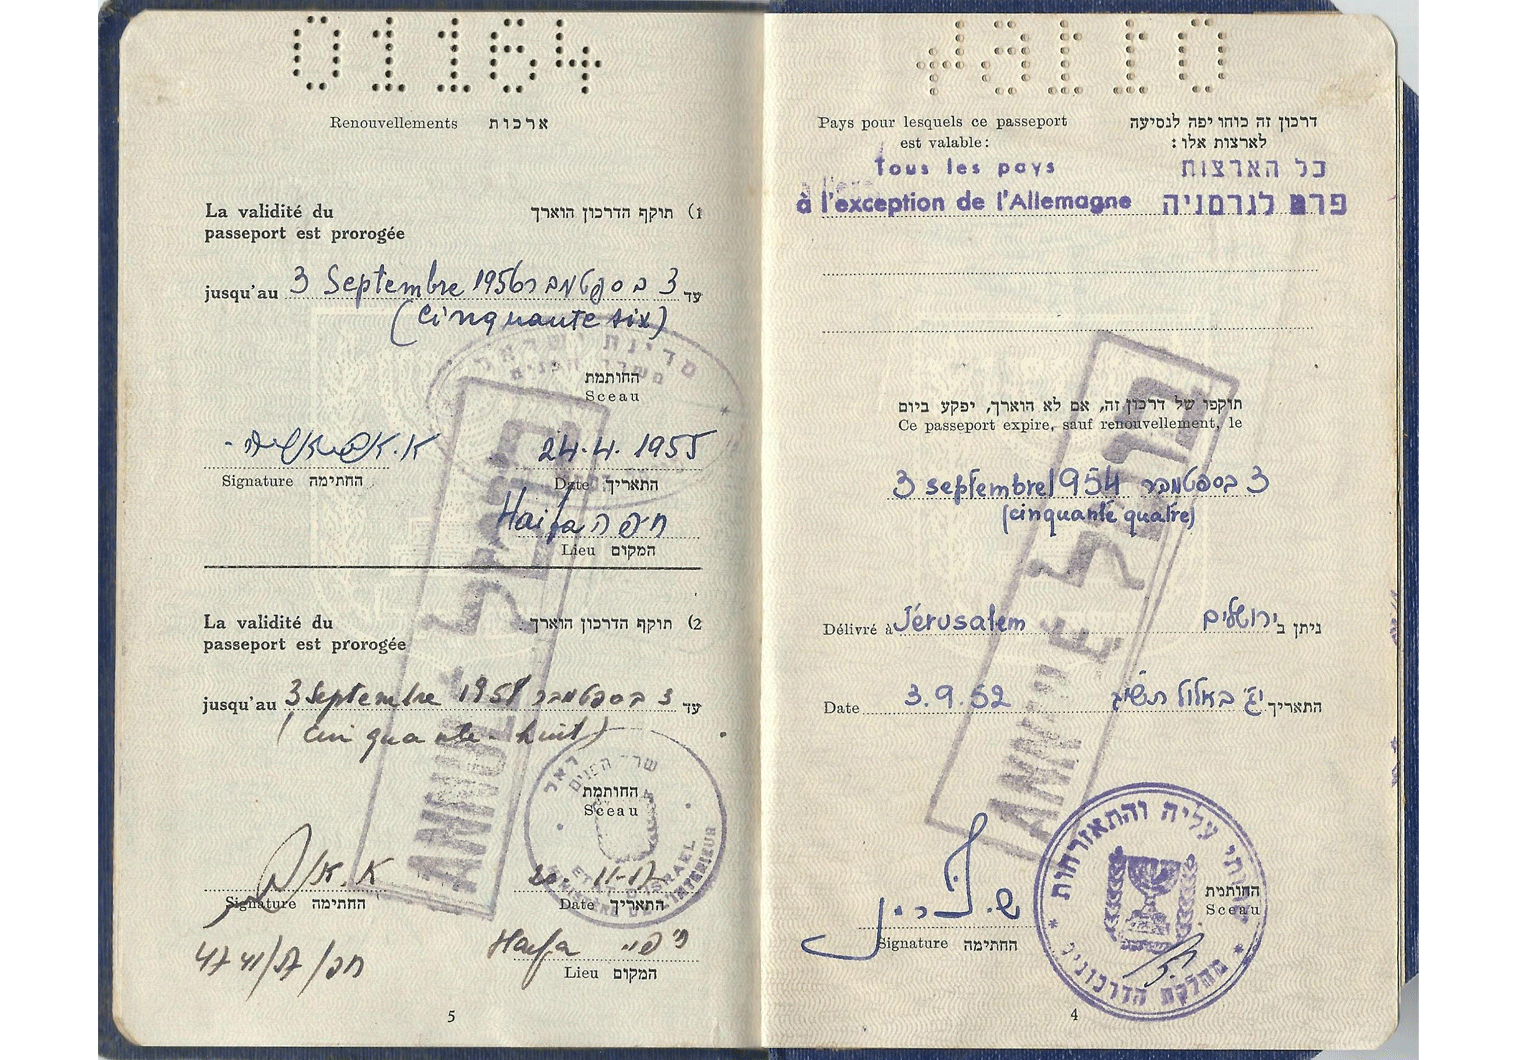 1952 Israeli passport